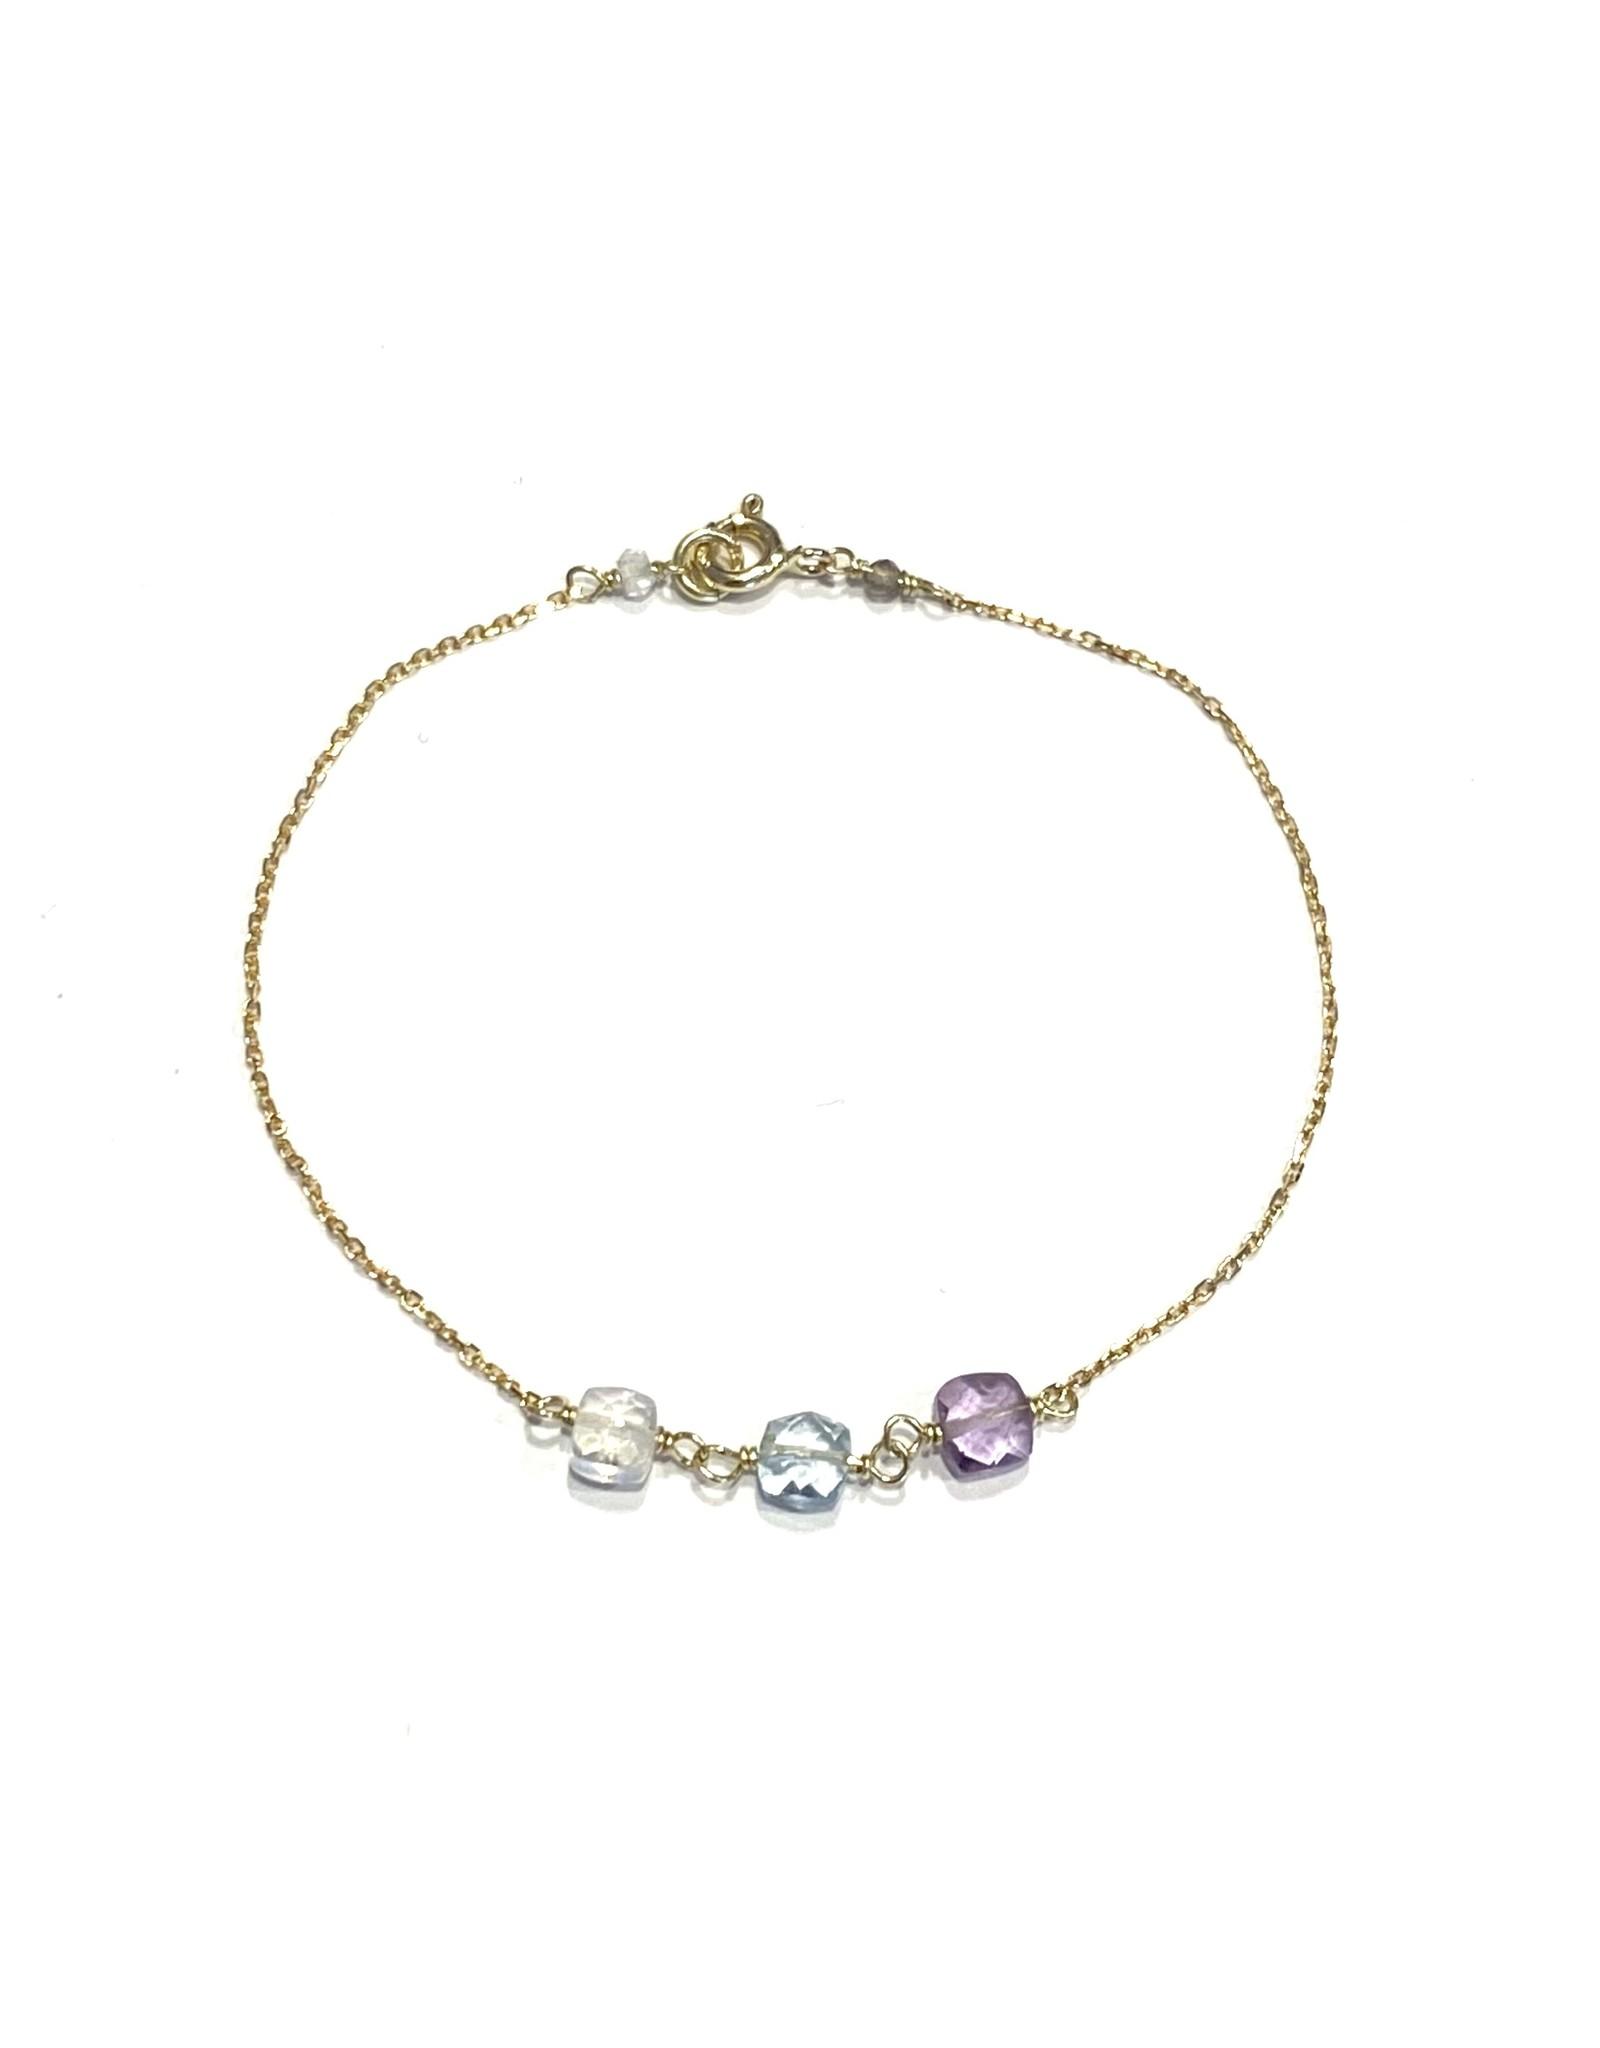 Bo Gold Bracelet - Gold - Chalcedony - Gemstone